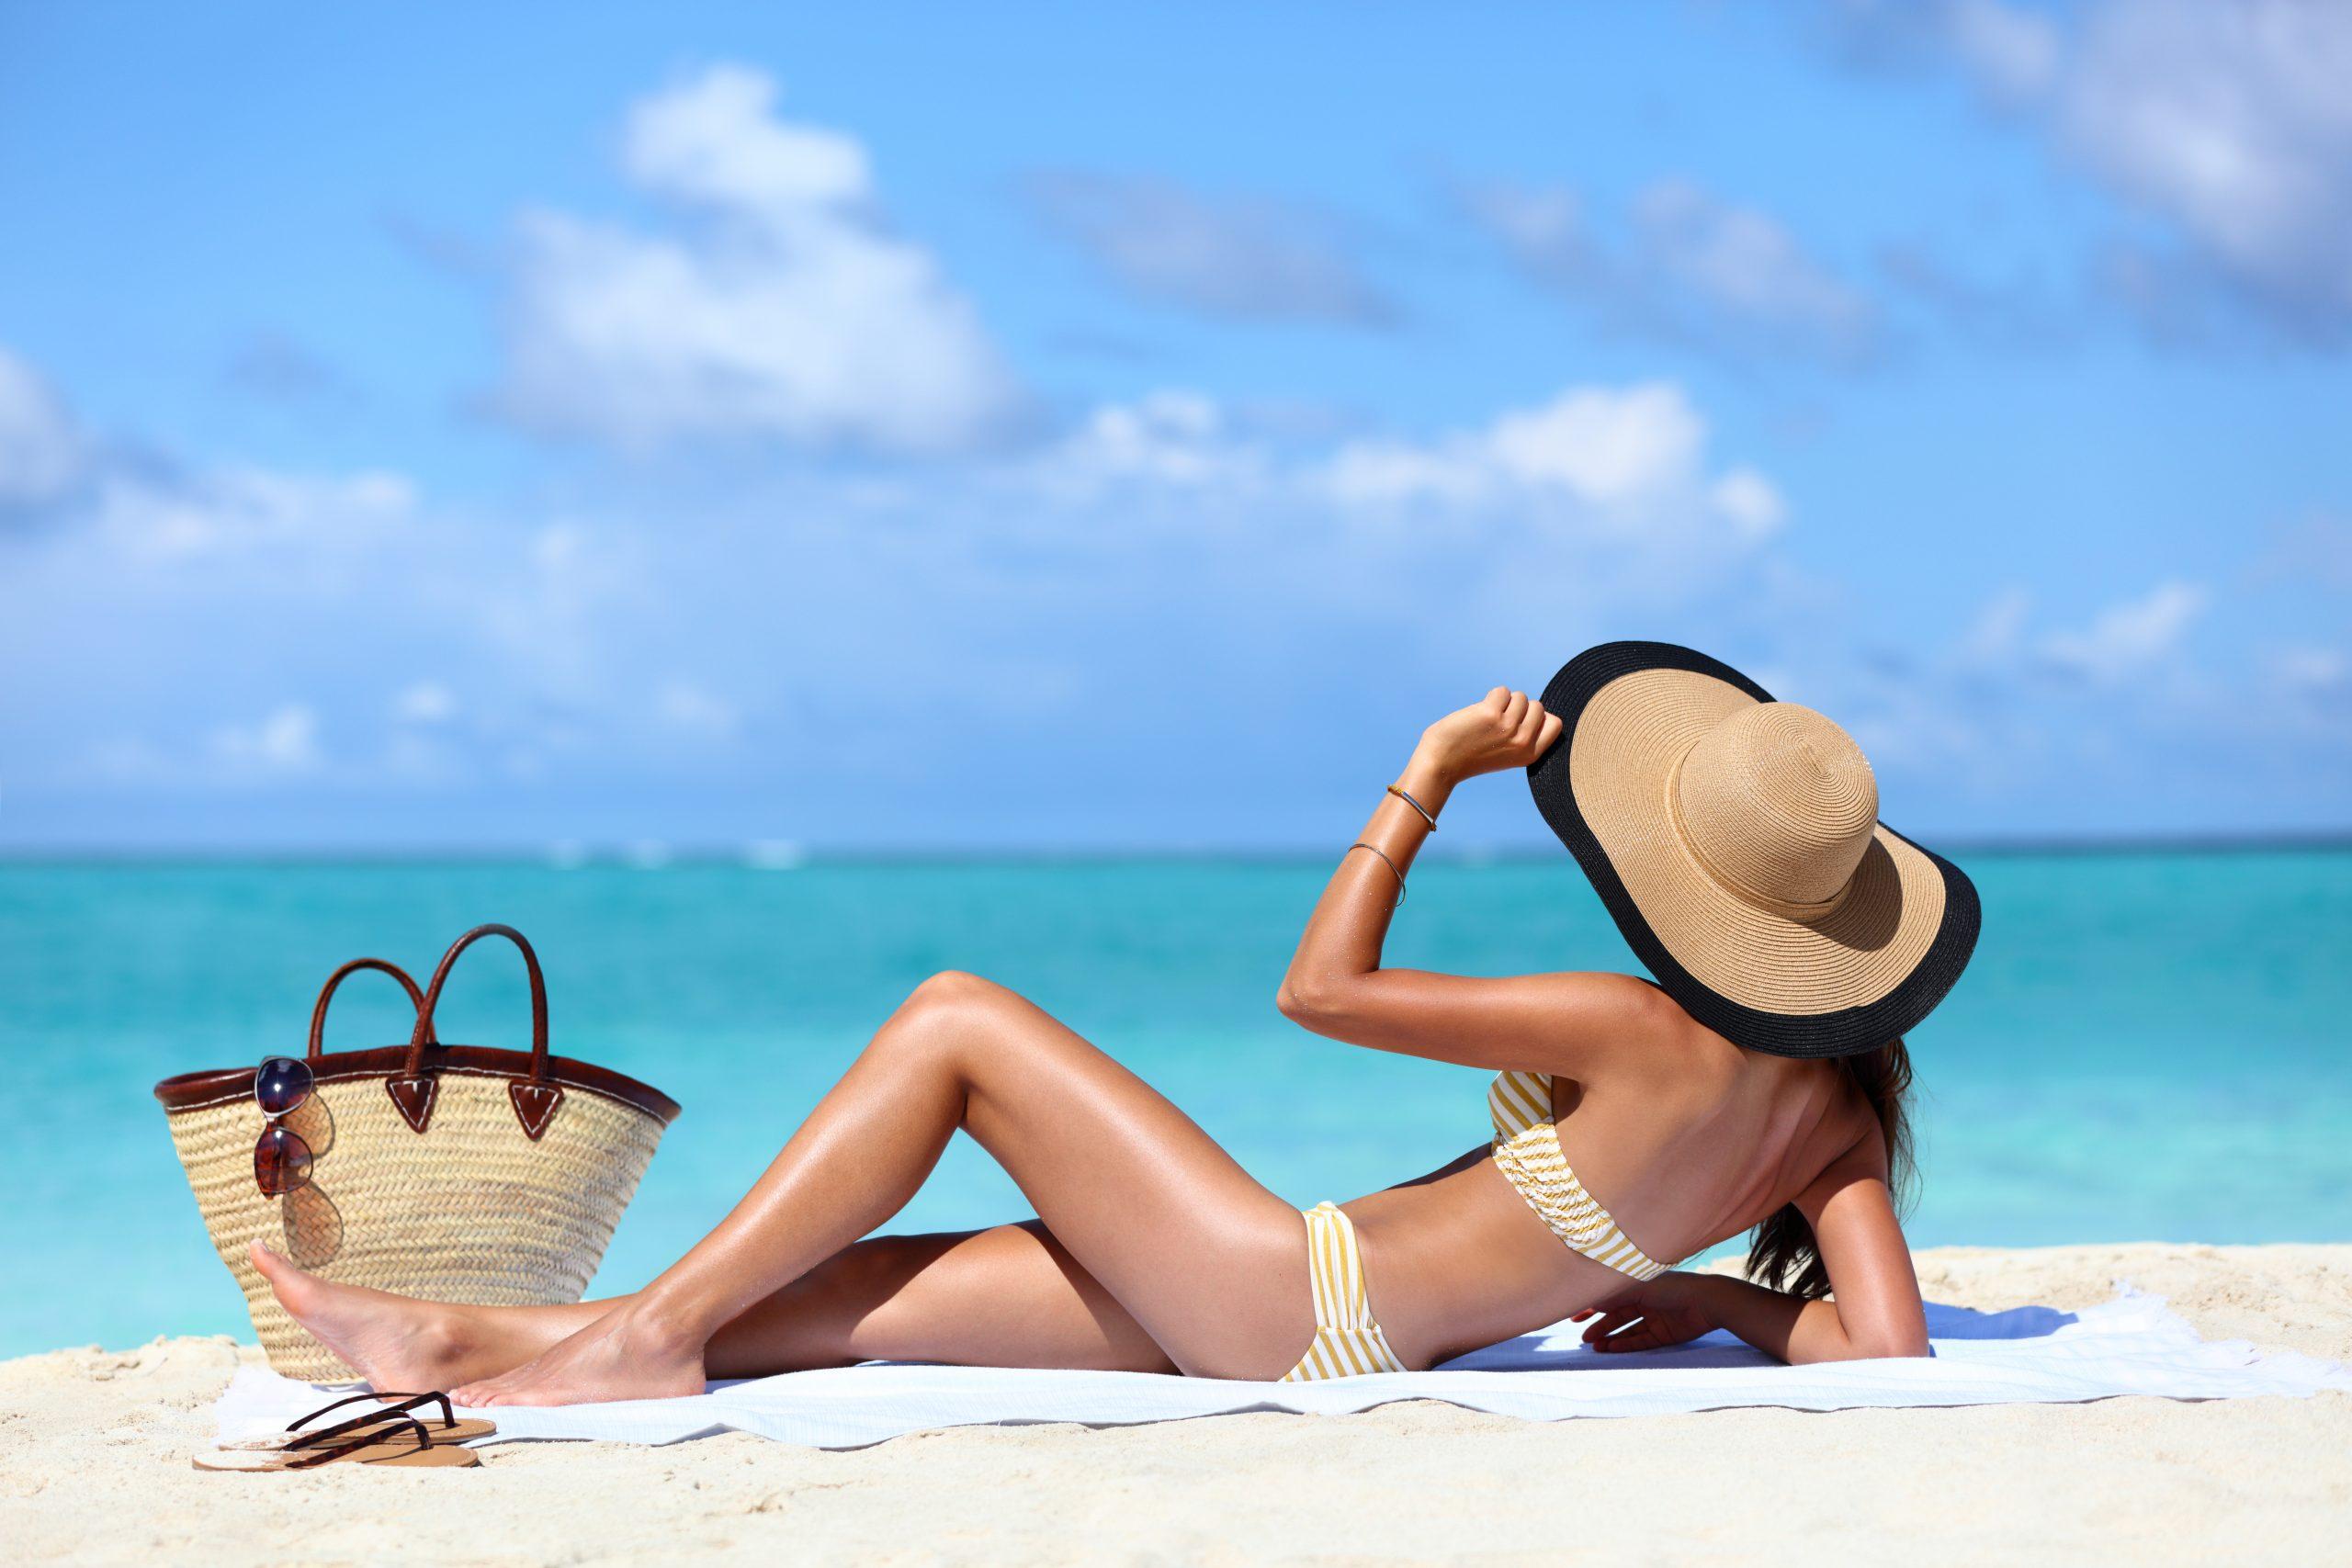 Skin Care: Τα μυστικά της after sun περιποίησης της επιδερμίδας σου